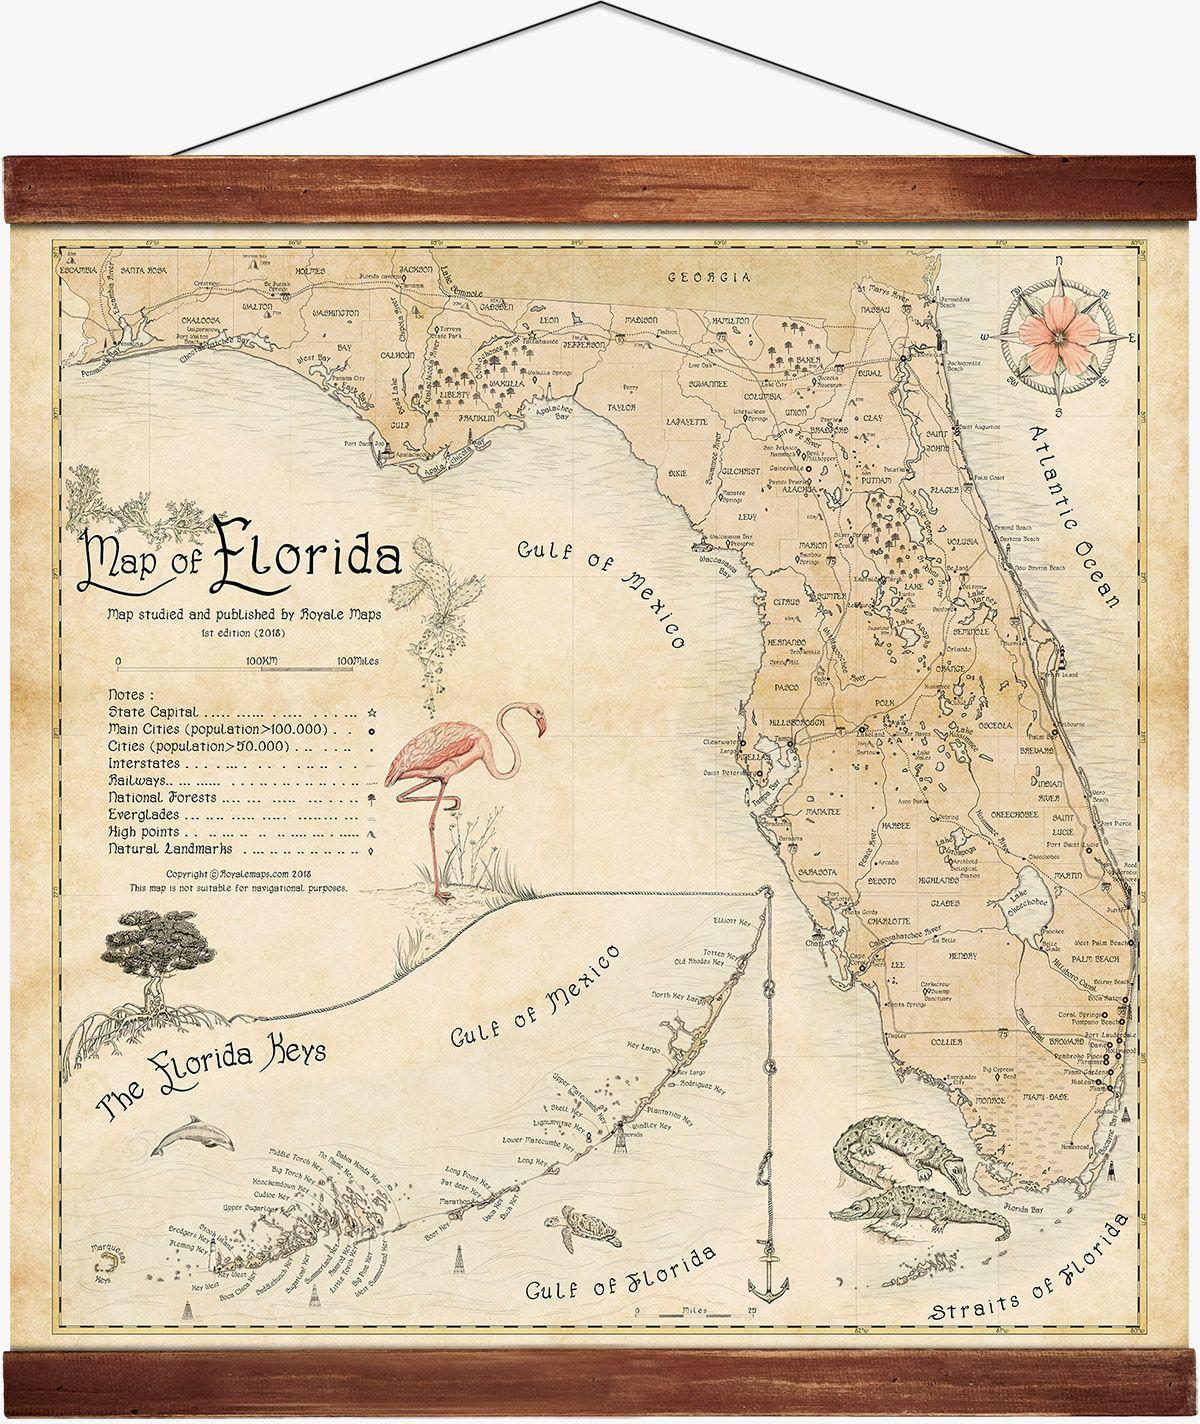 Map Of Florida Detailed.Map Of Florida Map Of Florida Map Detailed Map Of Florida Florida